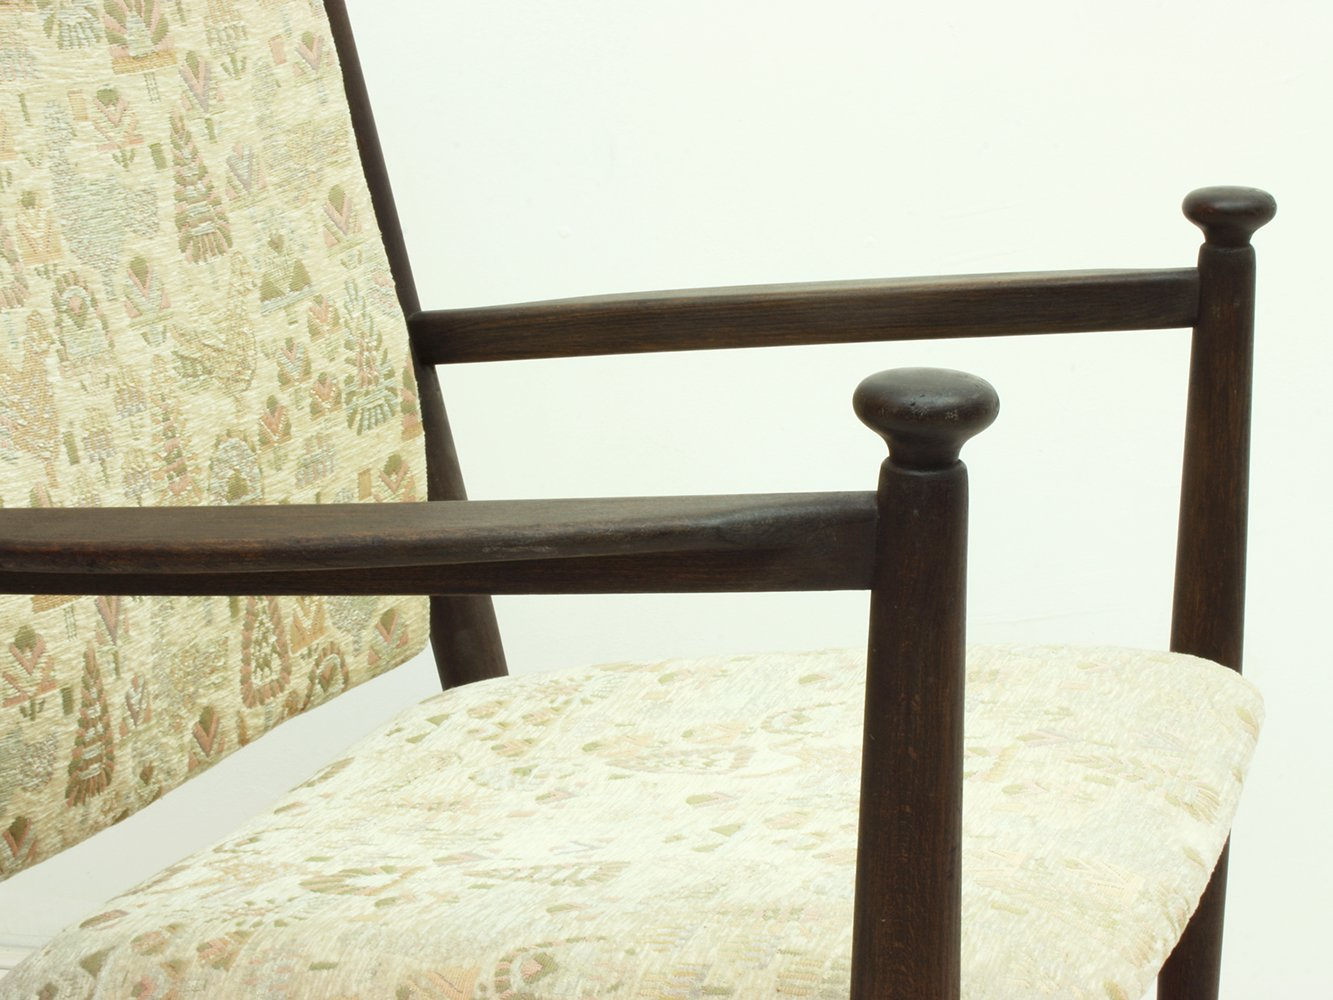 Dunkelbraun gebeizter schwedischer mid century for Schaukelstuhl dunkelbraun